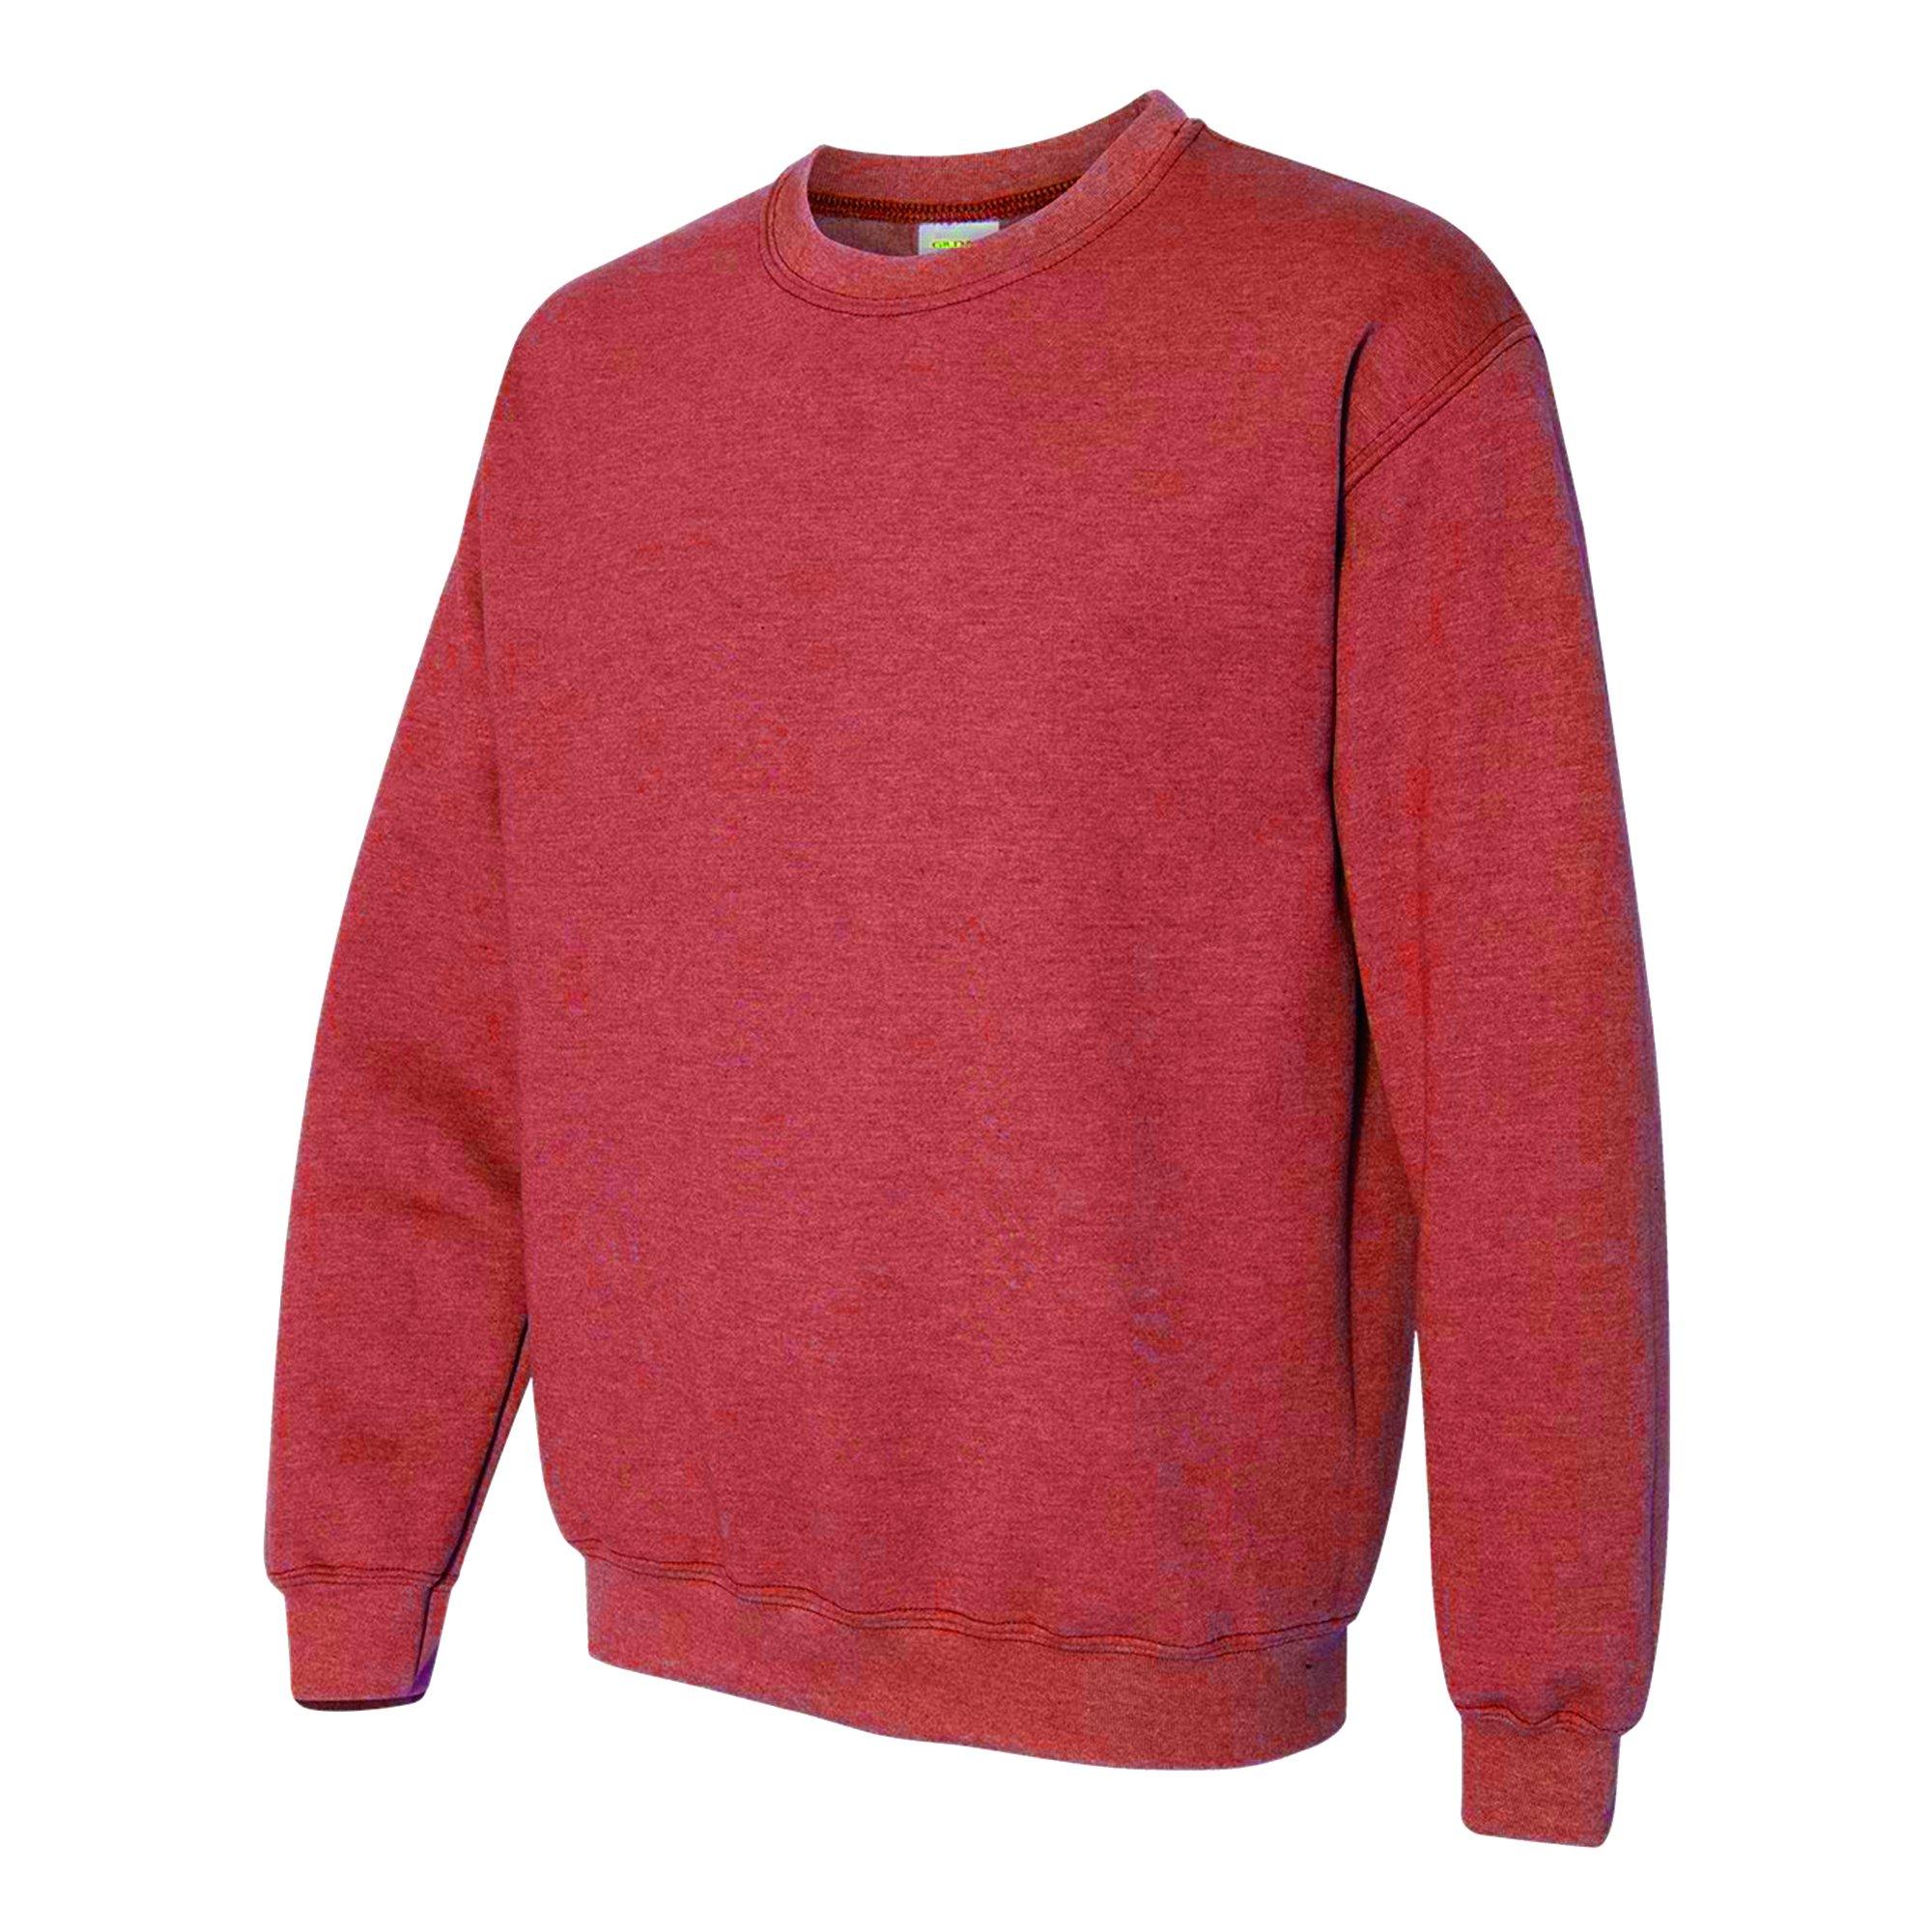 Gildan Heavy Blend Unisex Adult Crewneck Sweatshirt (XL) (Heather Sport Scarlet Red)